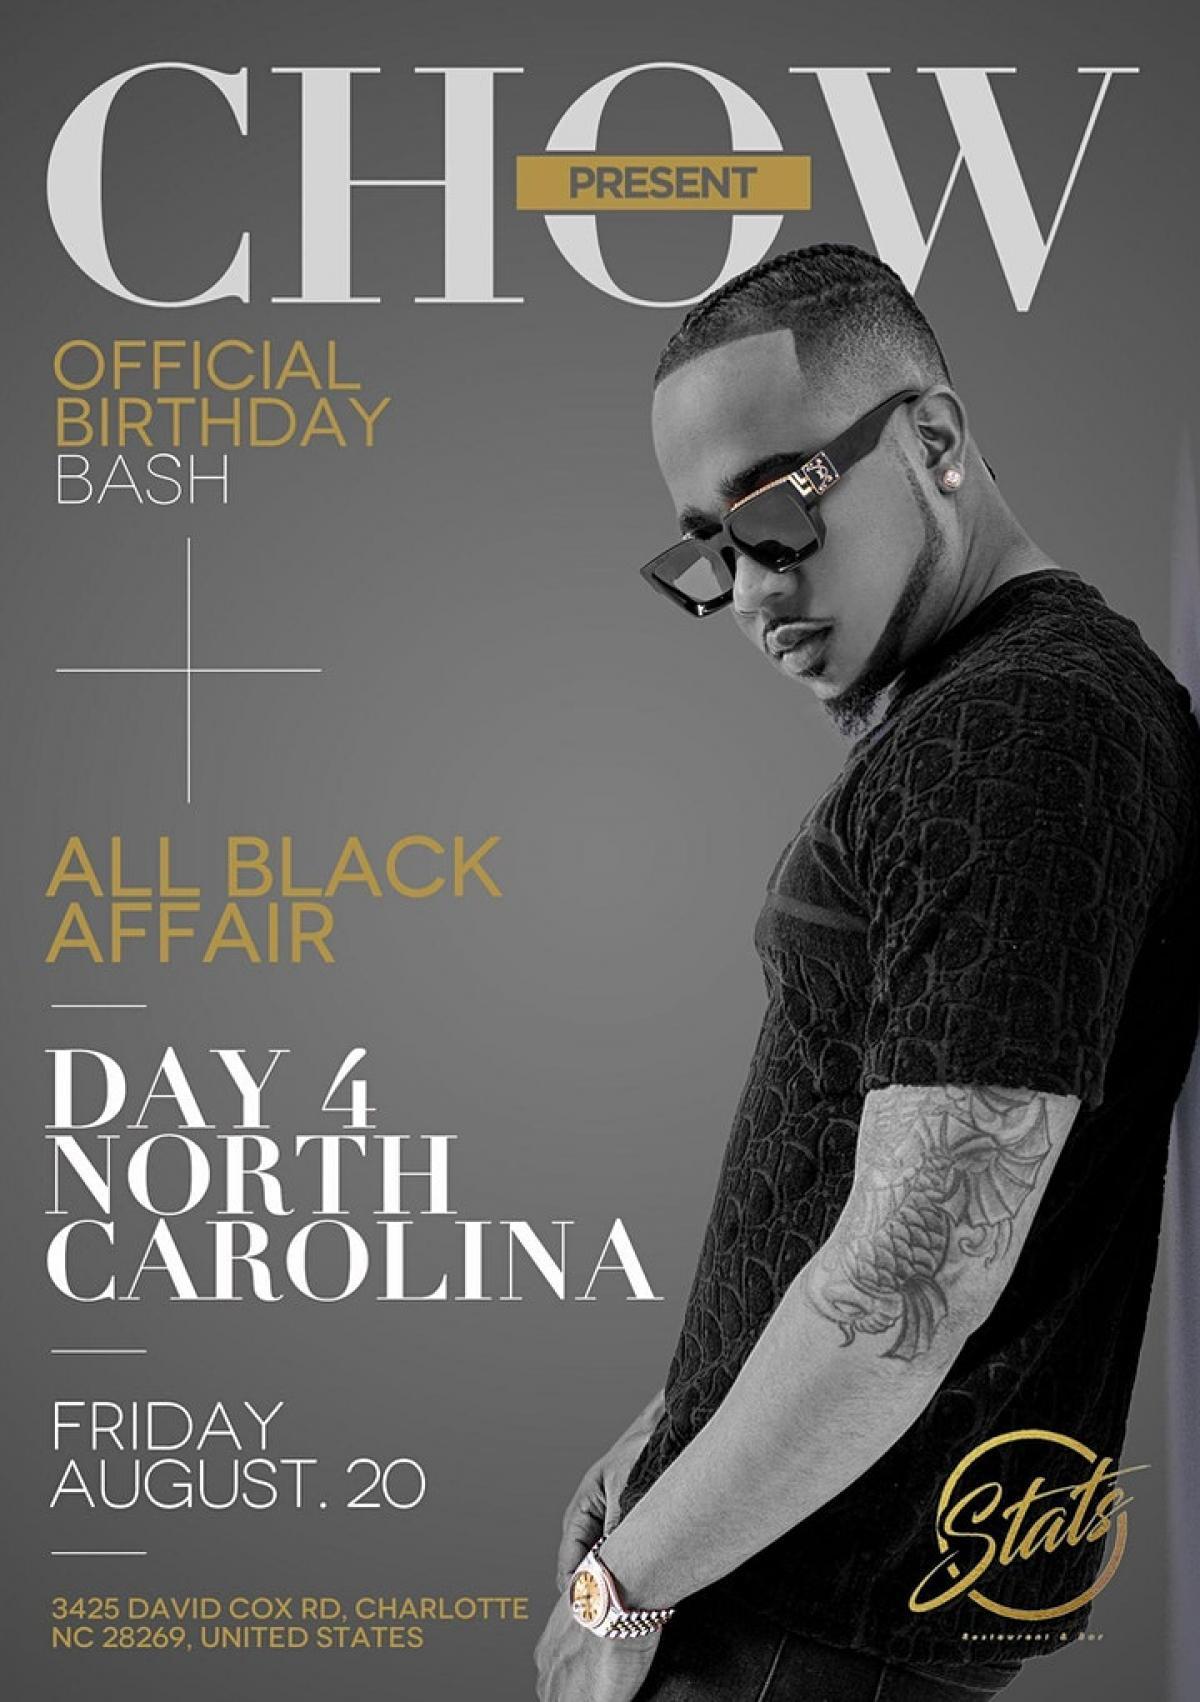 Dj Young Chow Birthday Bash NC: All Black Affair flyer or graphic.